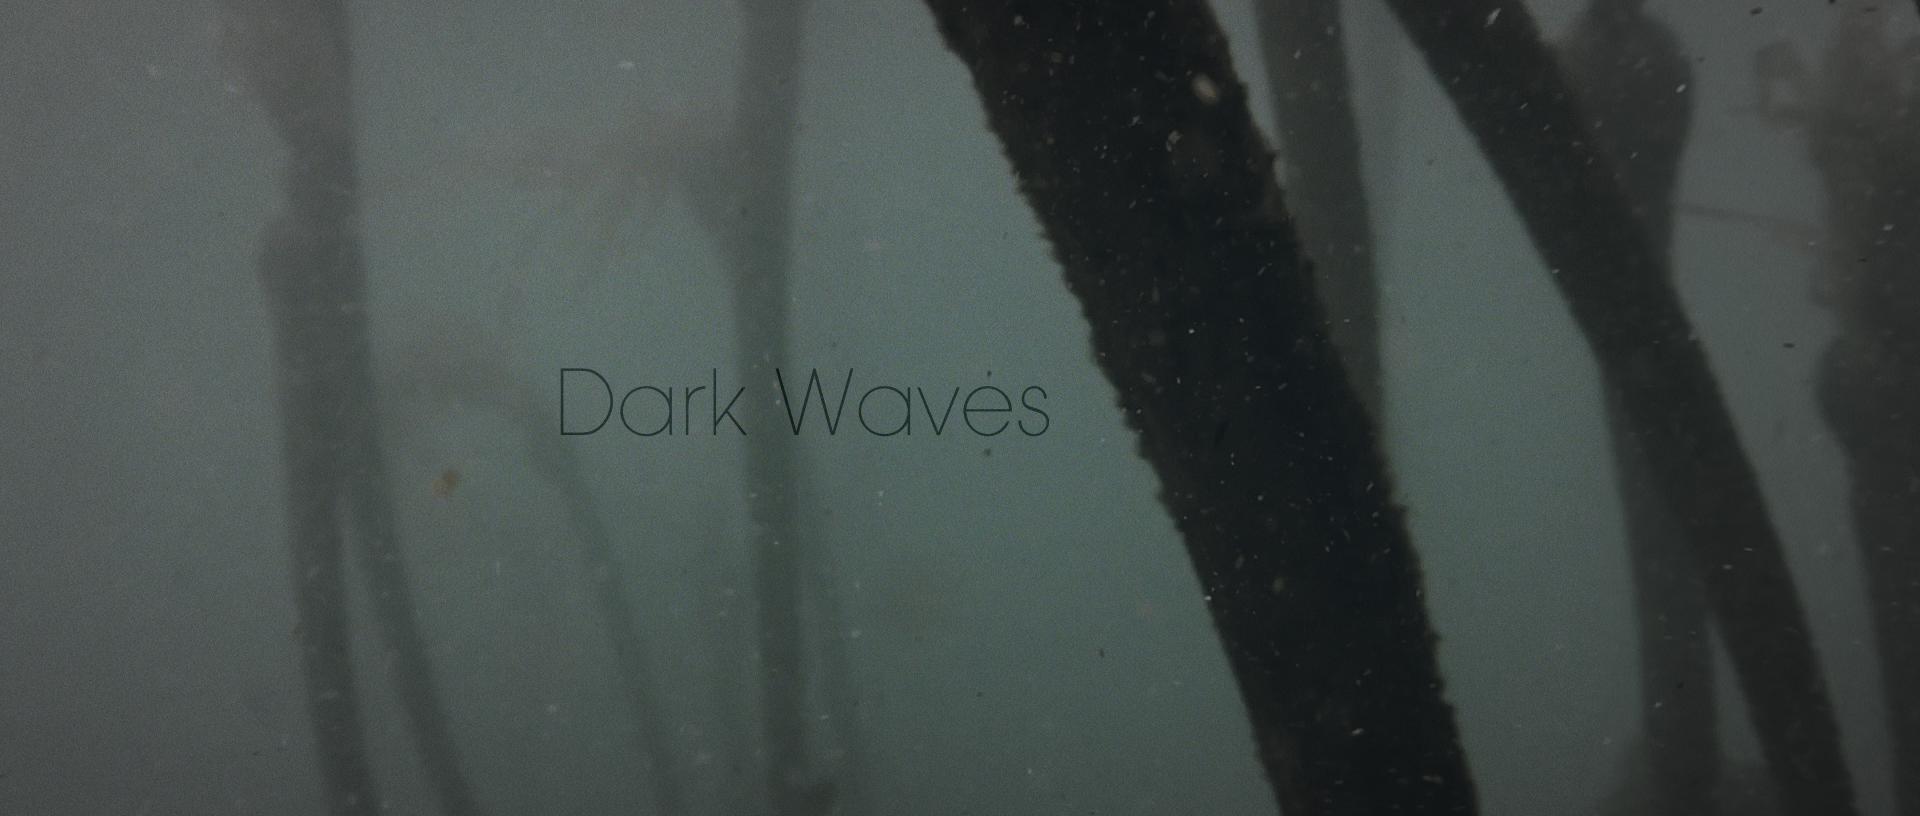 Dark Waves_2.1.1.jpg